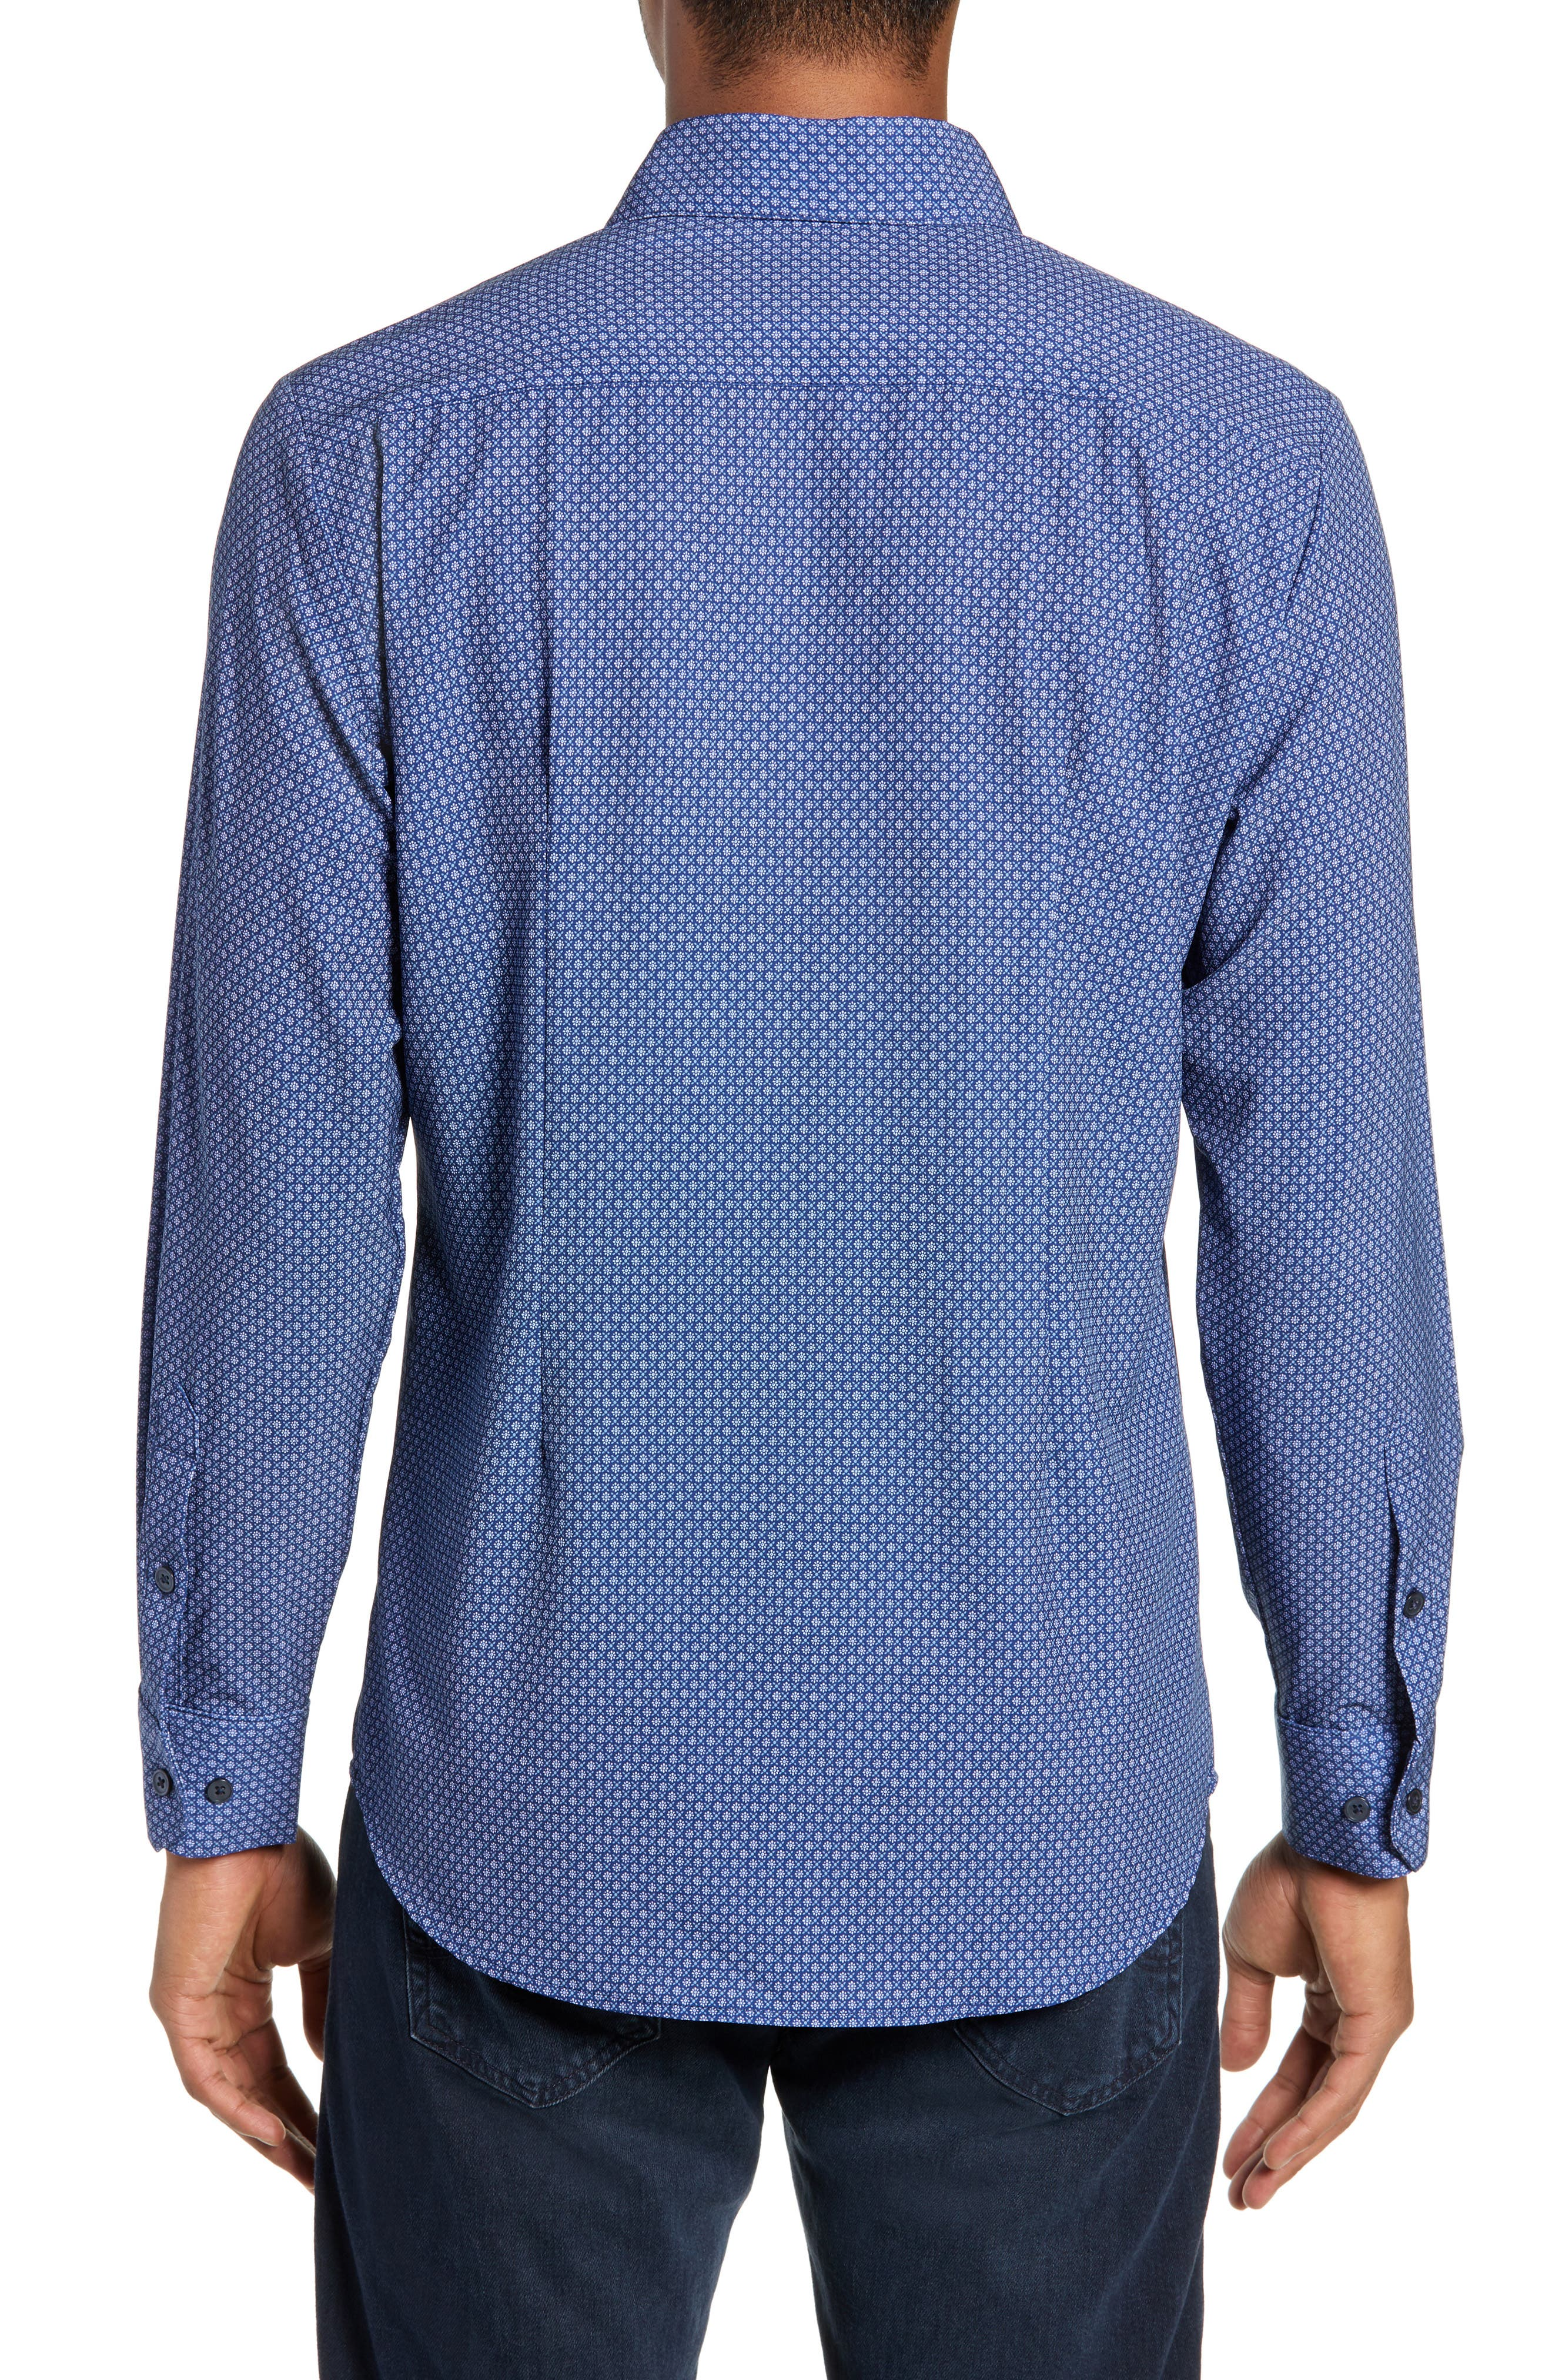 MIZZEN+MAIN, Atlantic Daisy Performance Sport Shirt, Alternate thumbnail 3, color, NAVY